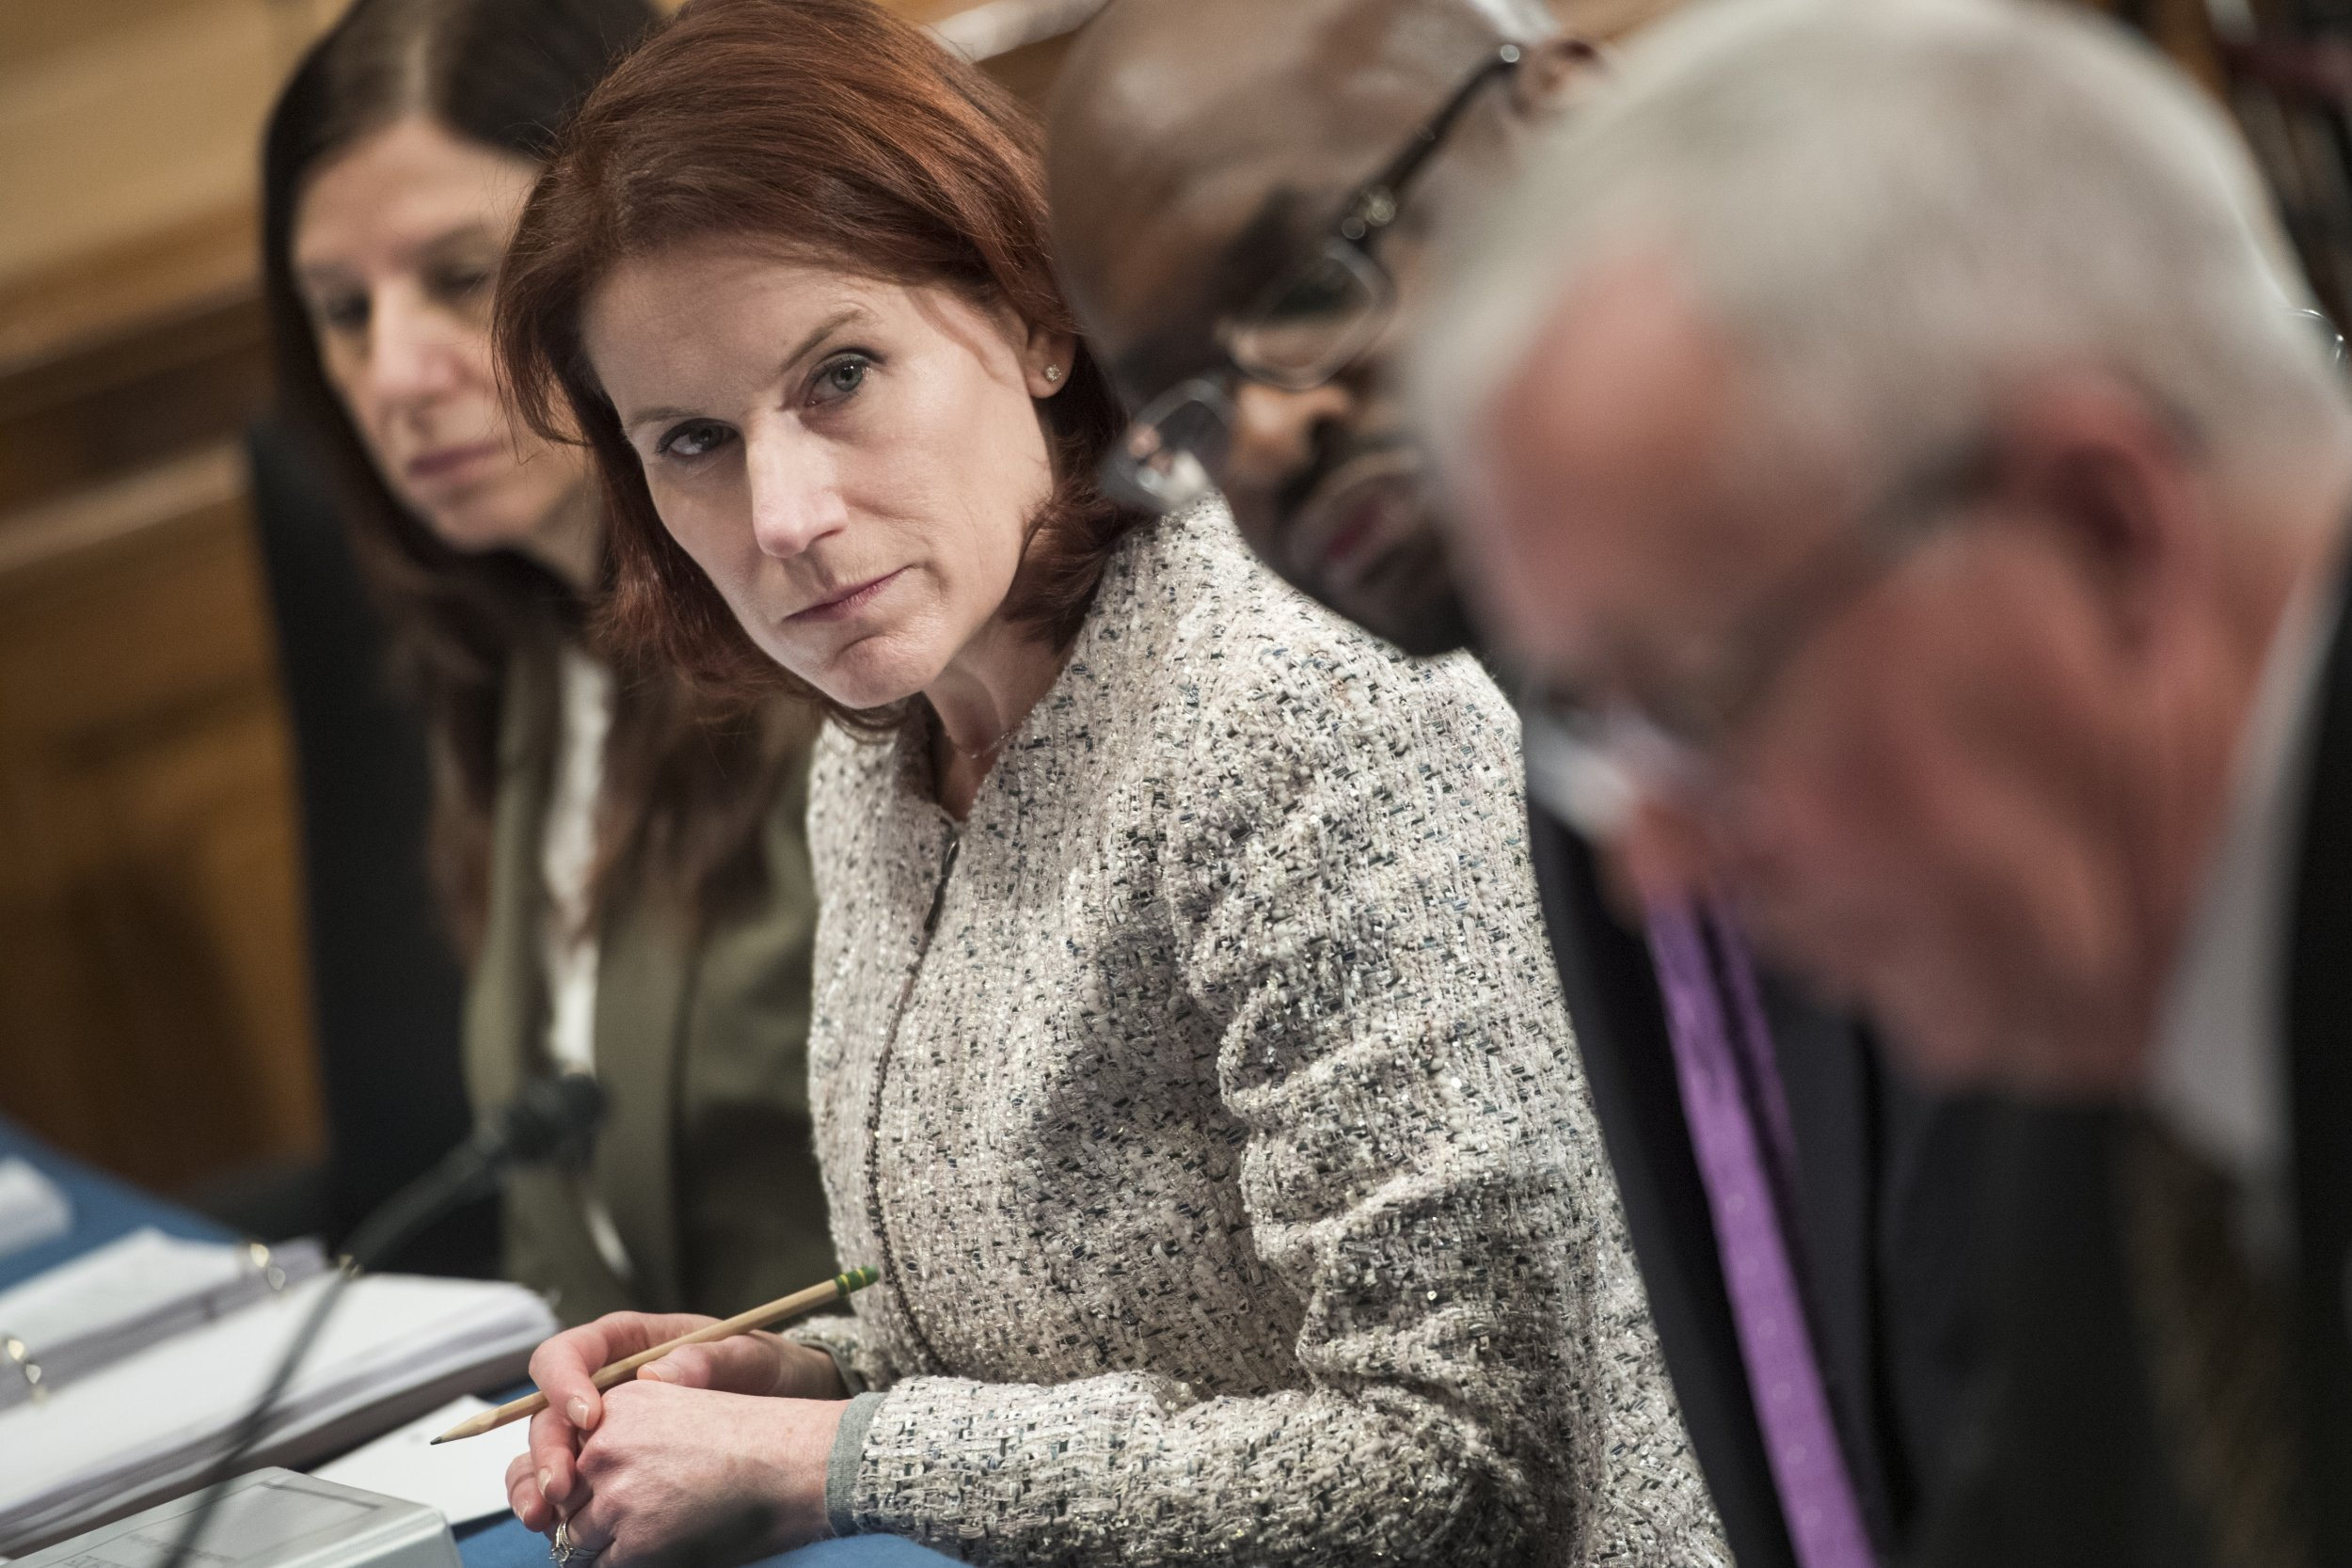 Claire Grady Donald Trump fired